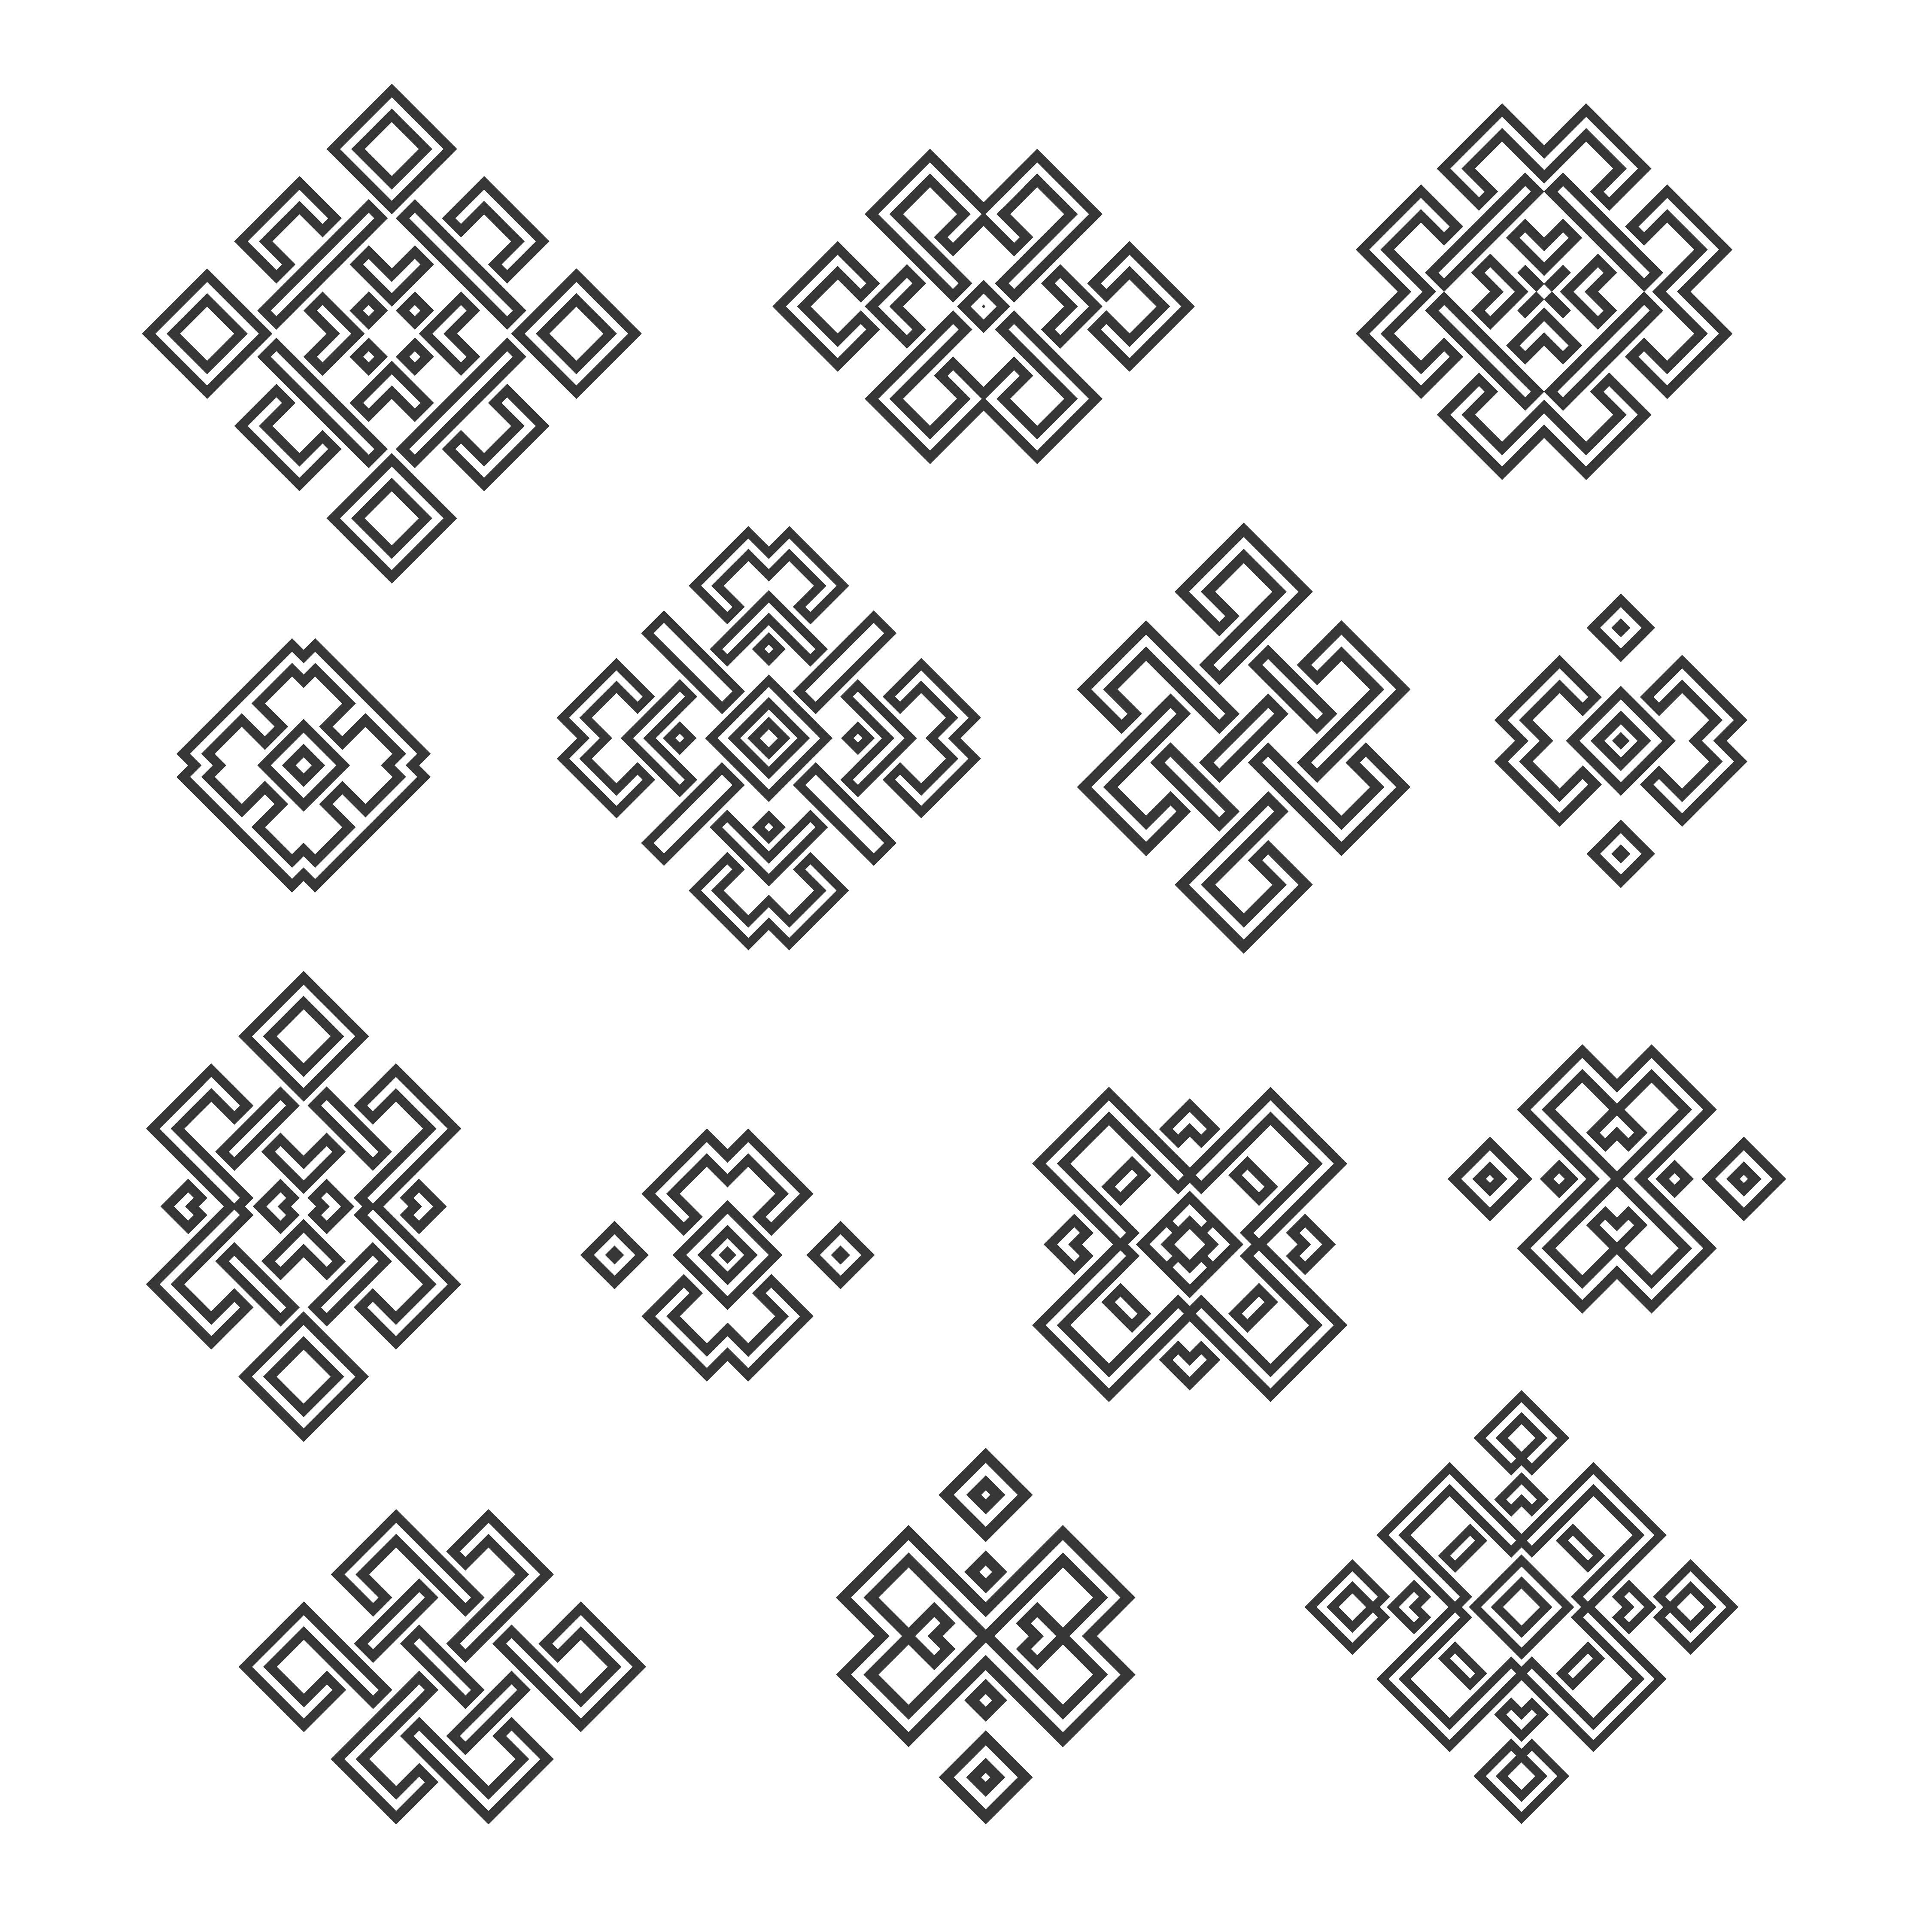 Ethnic Signs And Symbols 435162